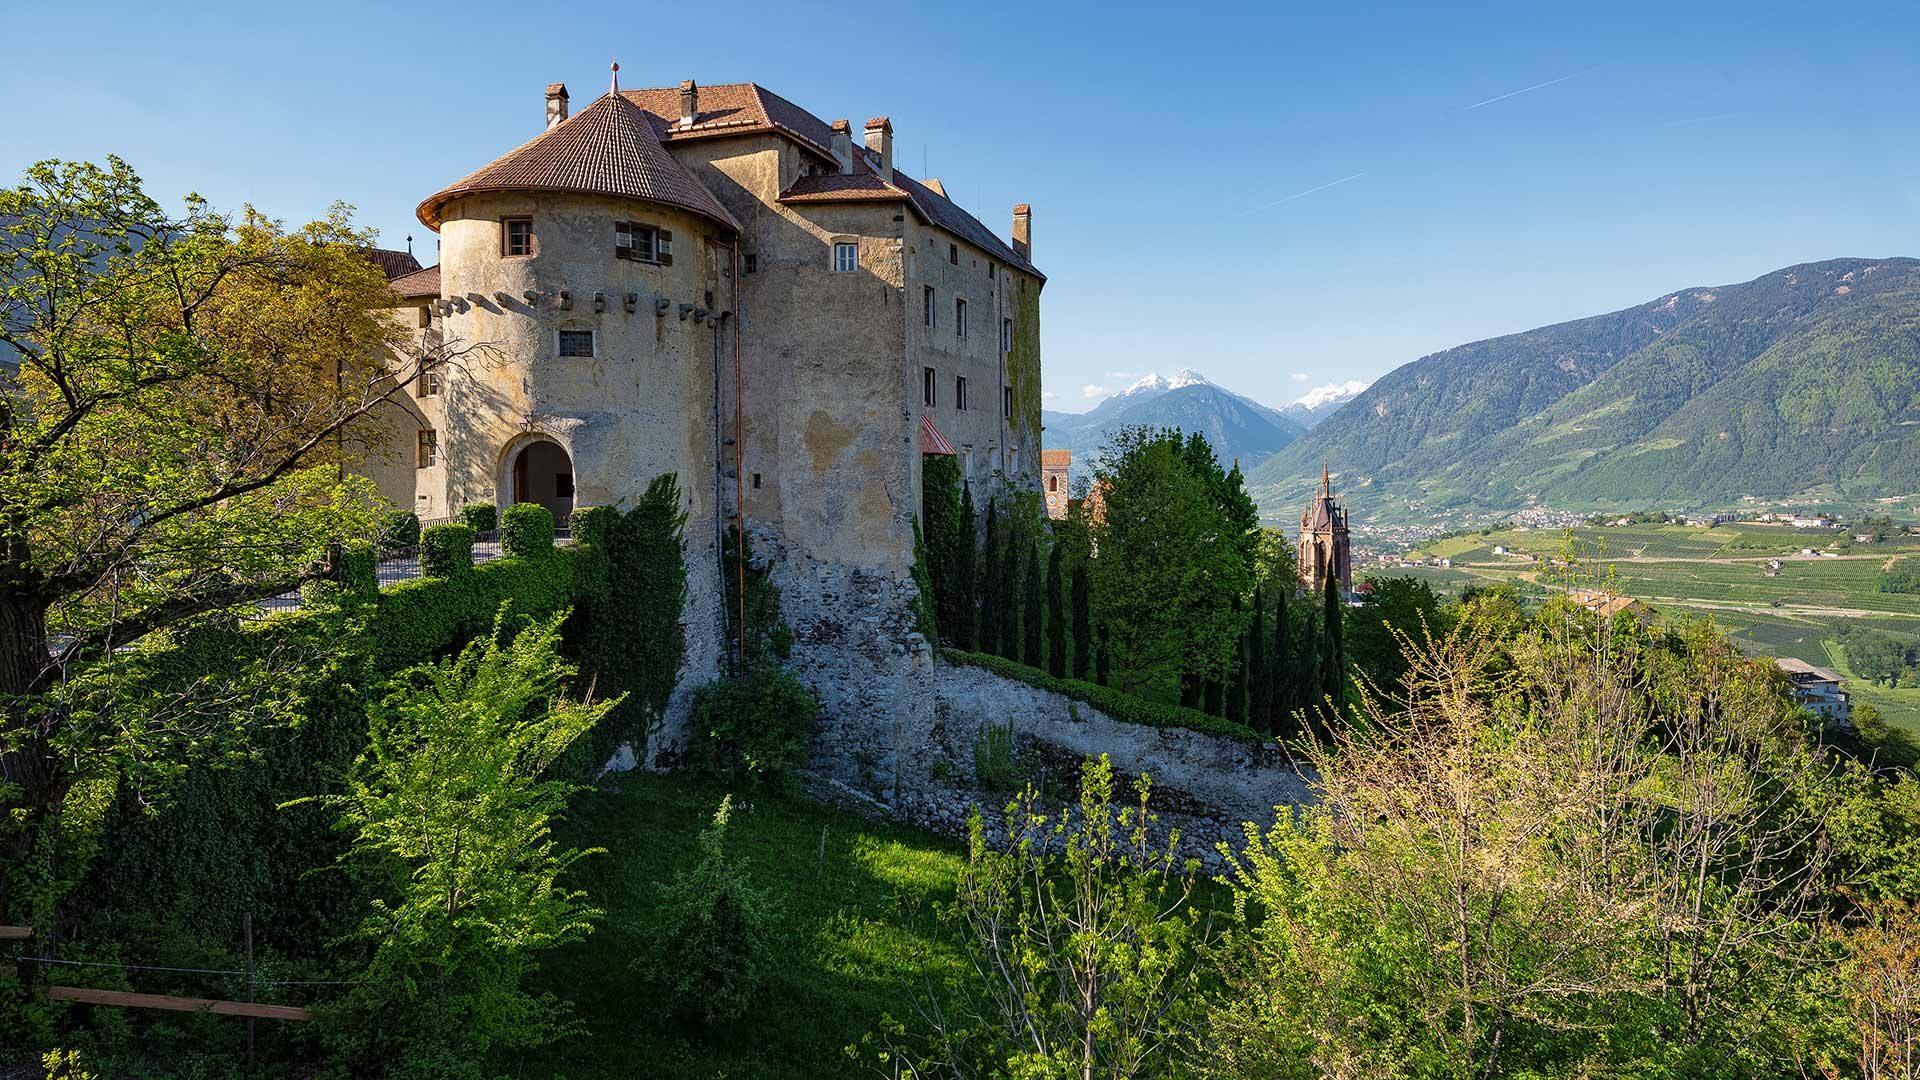 Schloss Schenna & Mausoleum